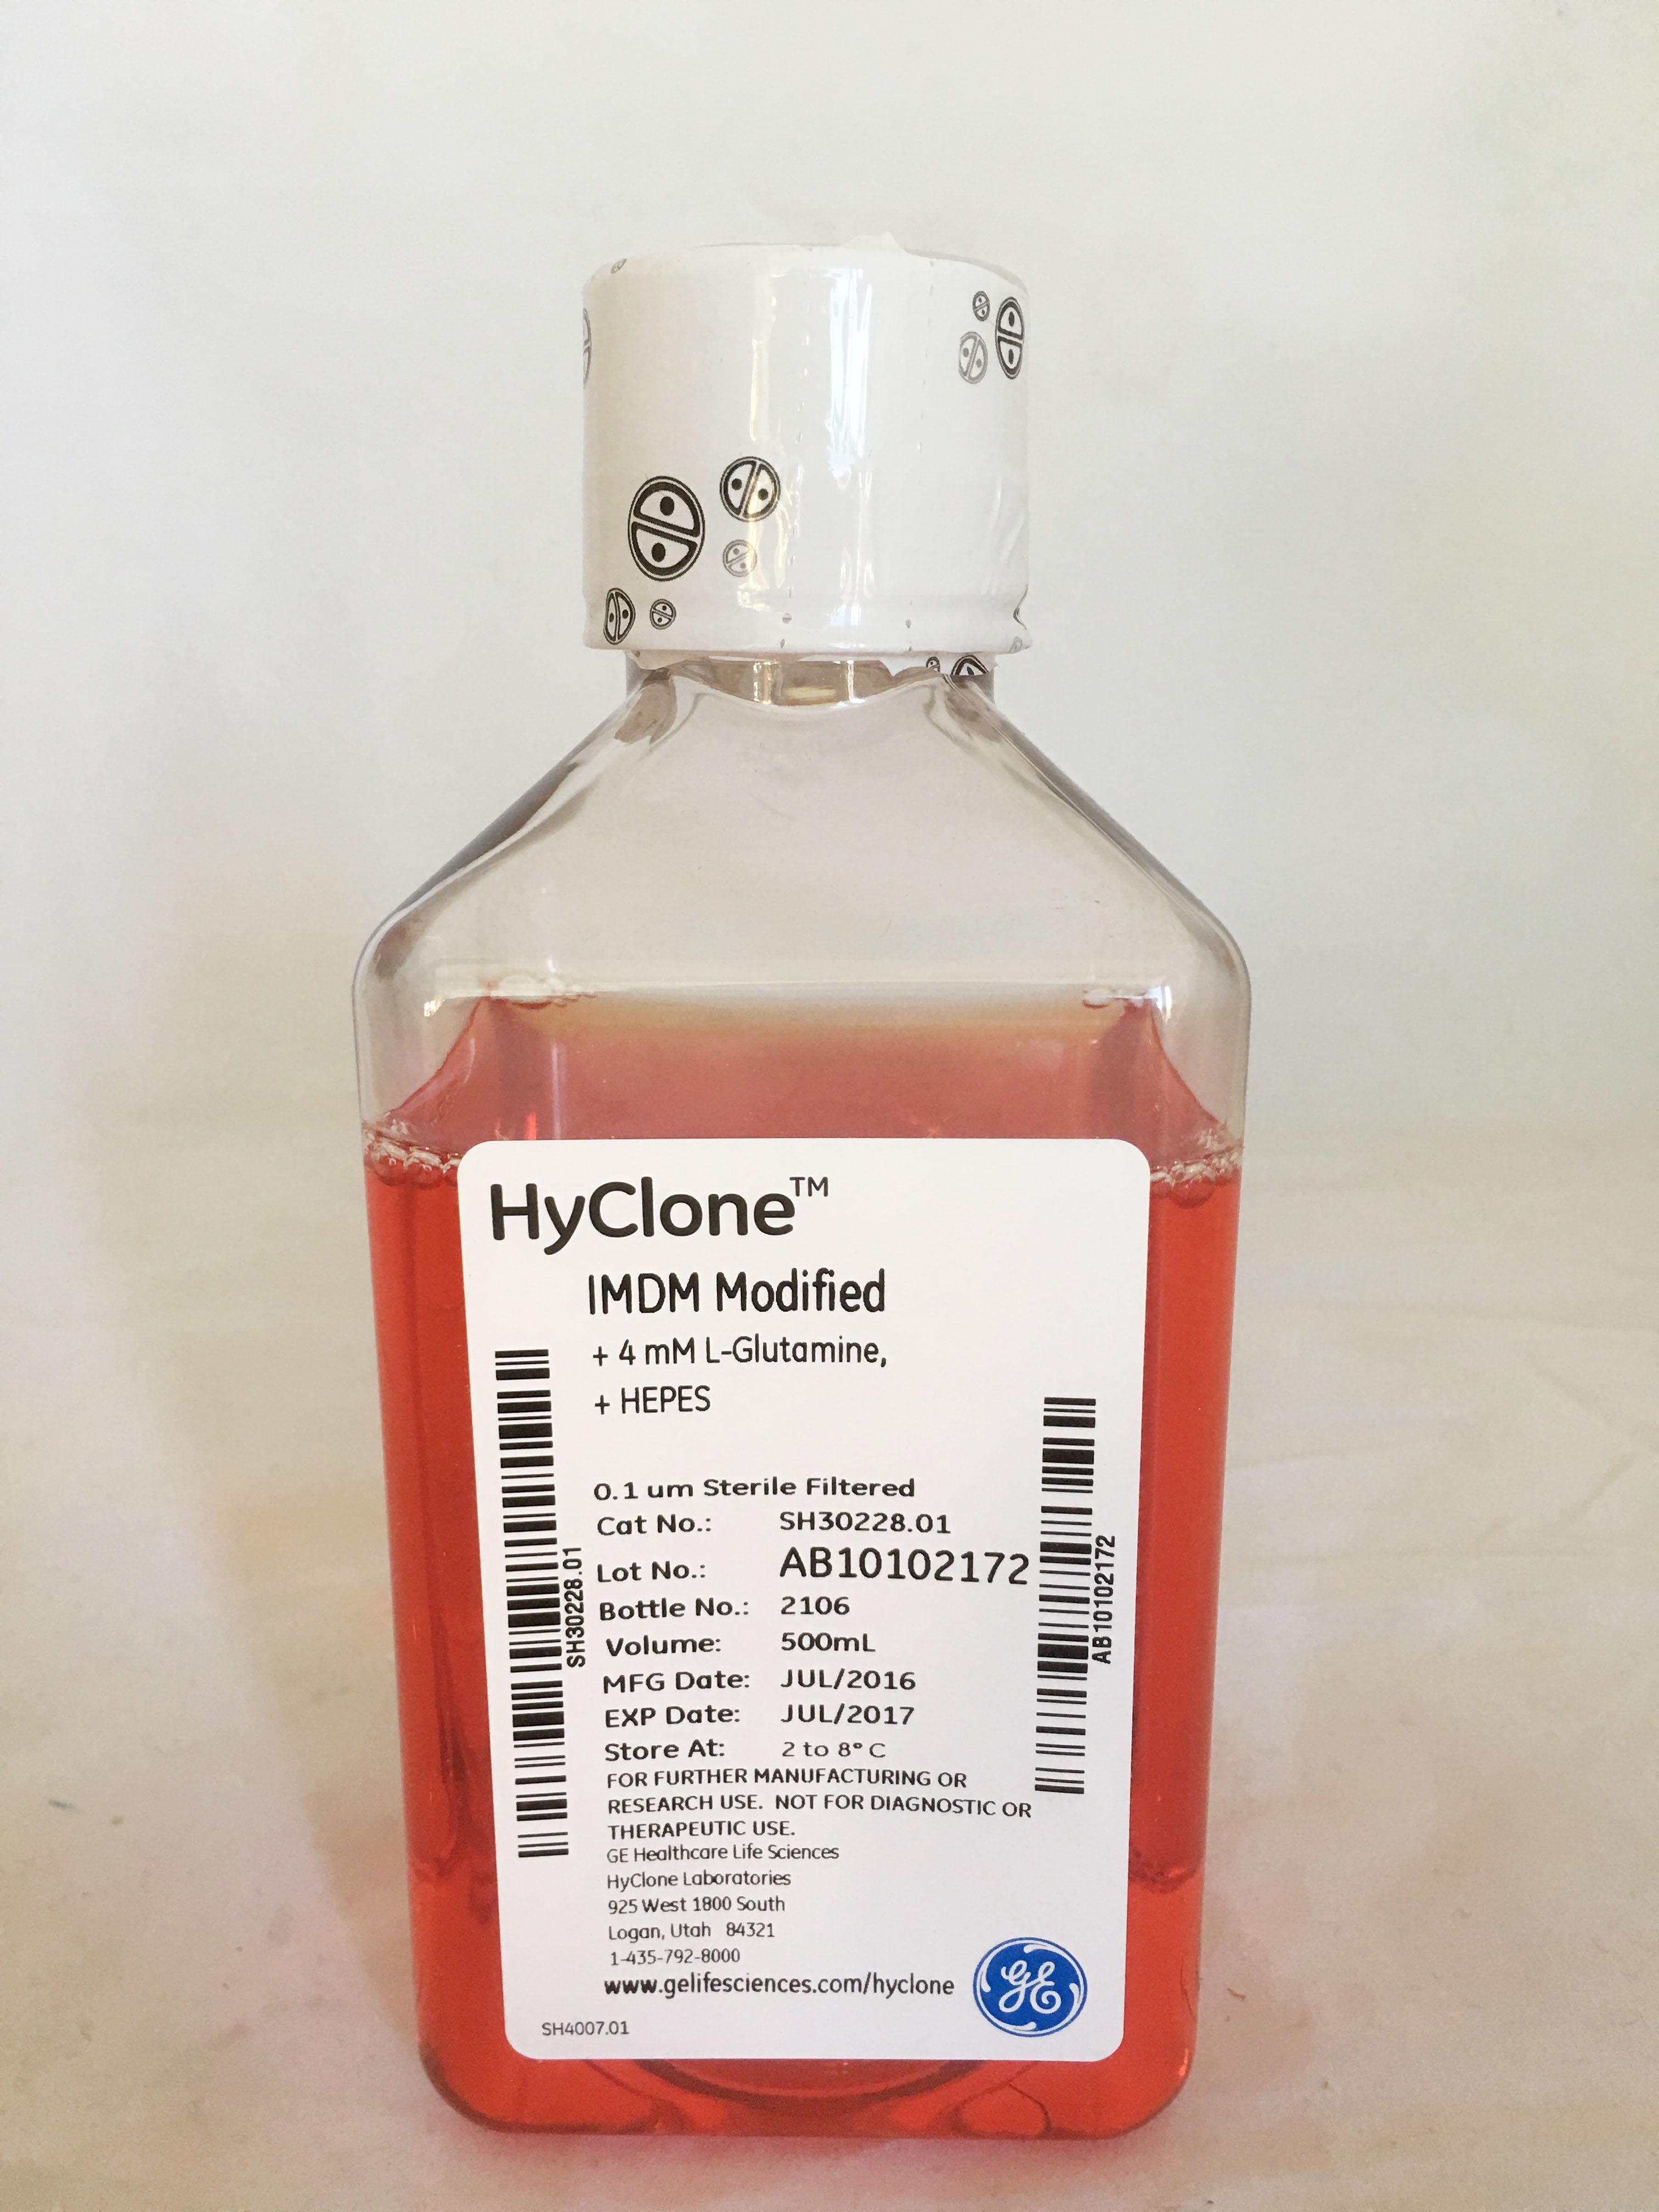 IMDM with L-Glutamine,HEPES,without Alpha-Thioglycerol(美国原装进口),500ml  SH30228.01(替代原国产分装产品SH30228.01B) HyClone